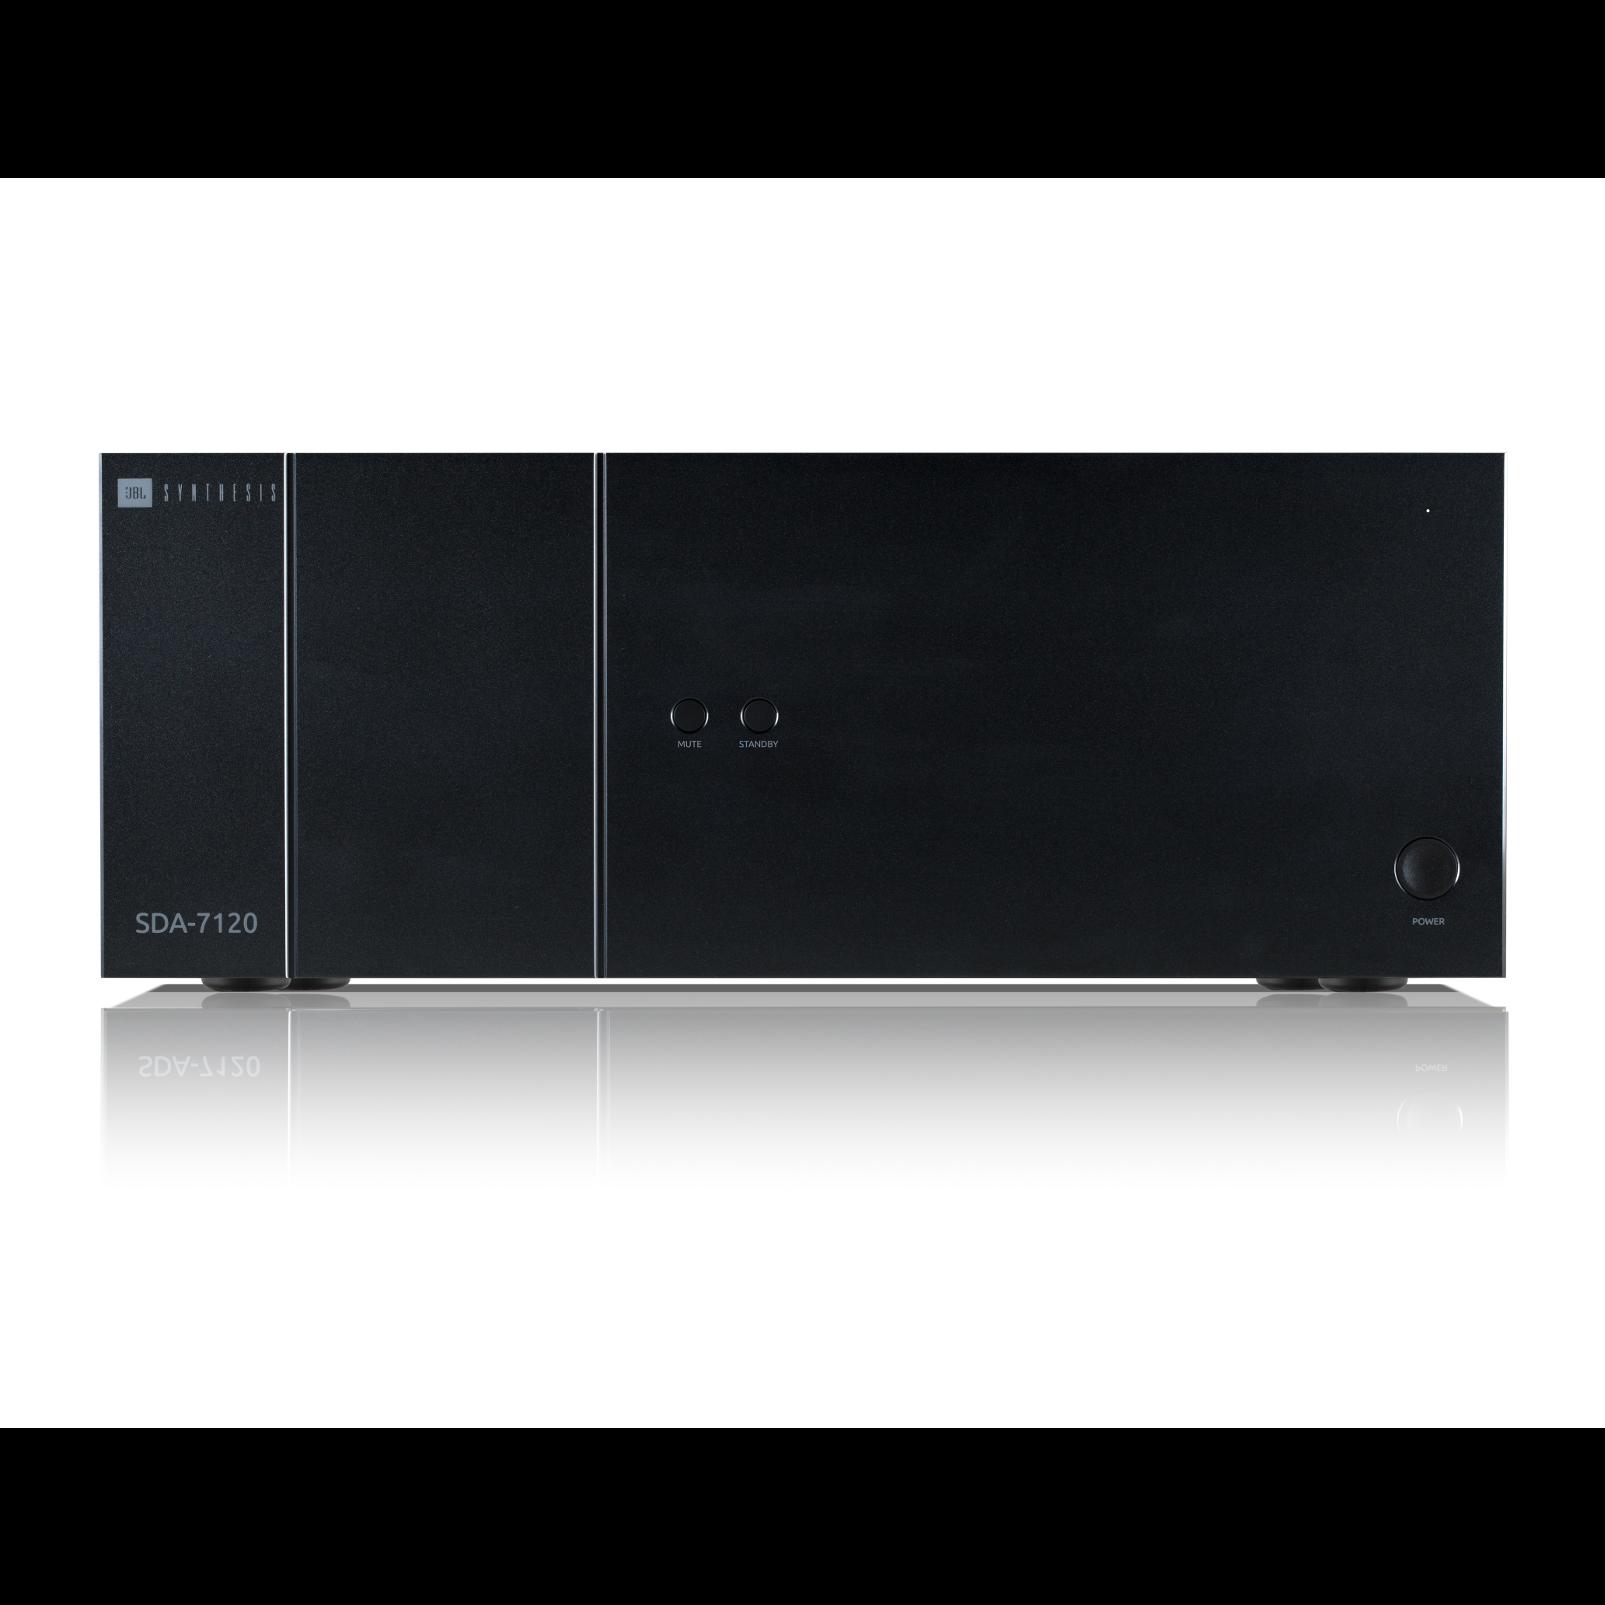 JBL Synthesis - SDA-7120